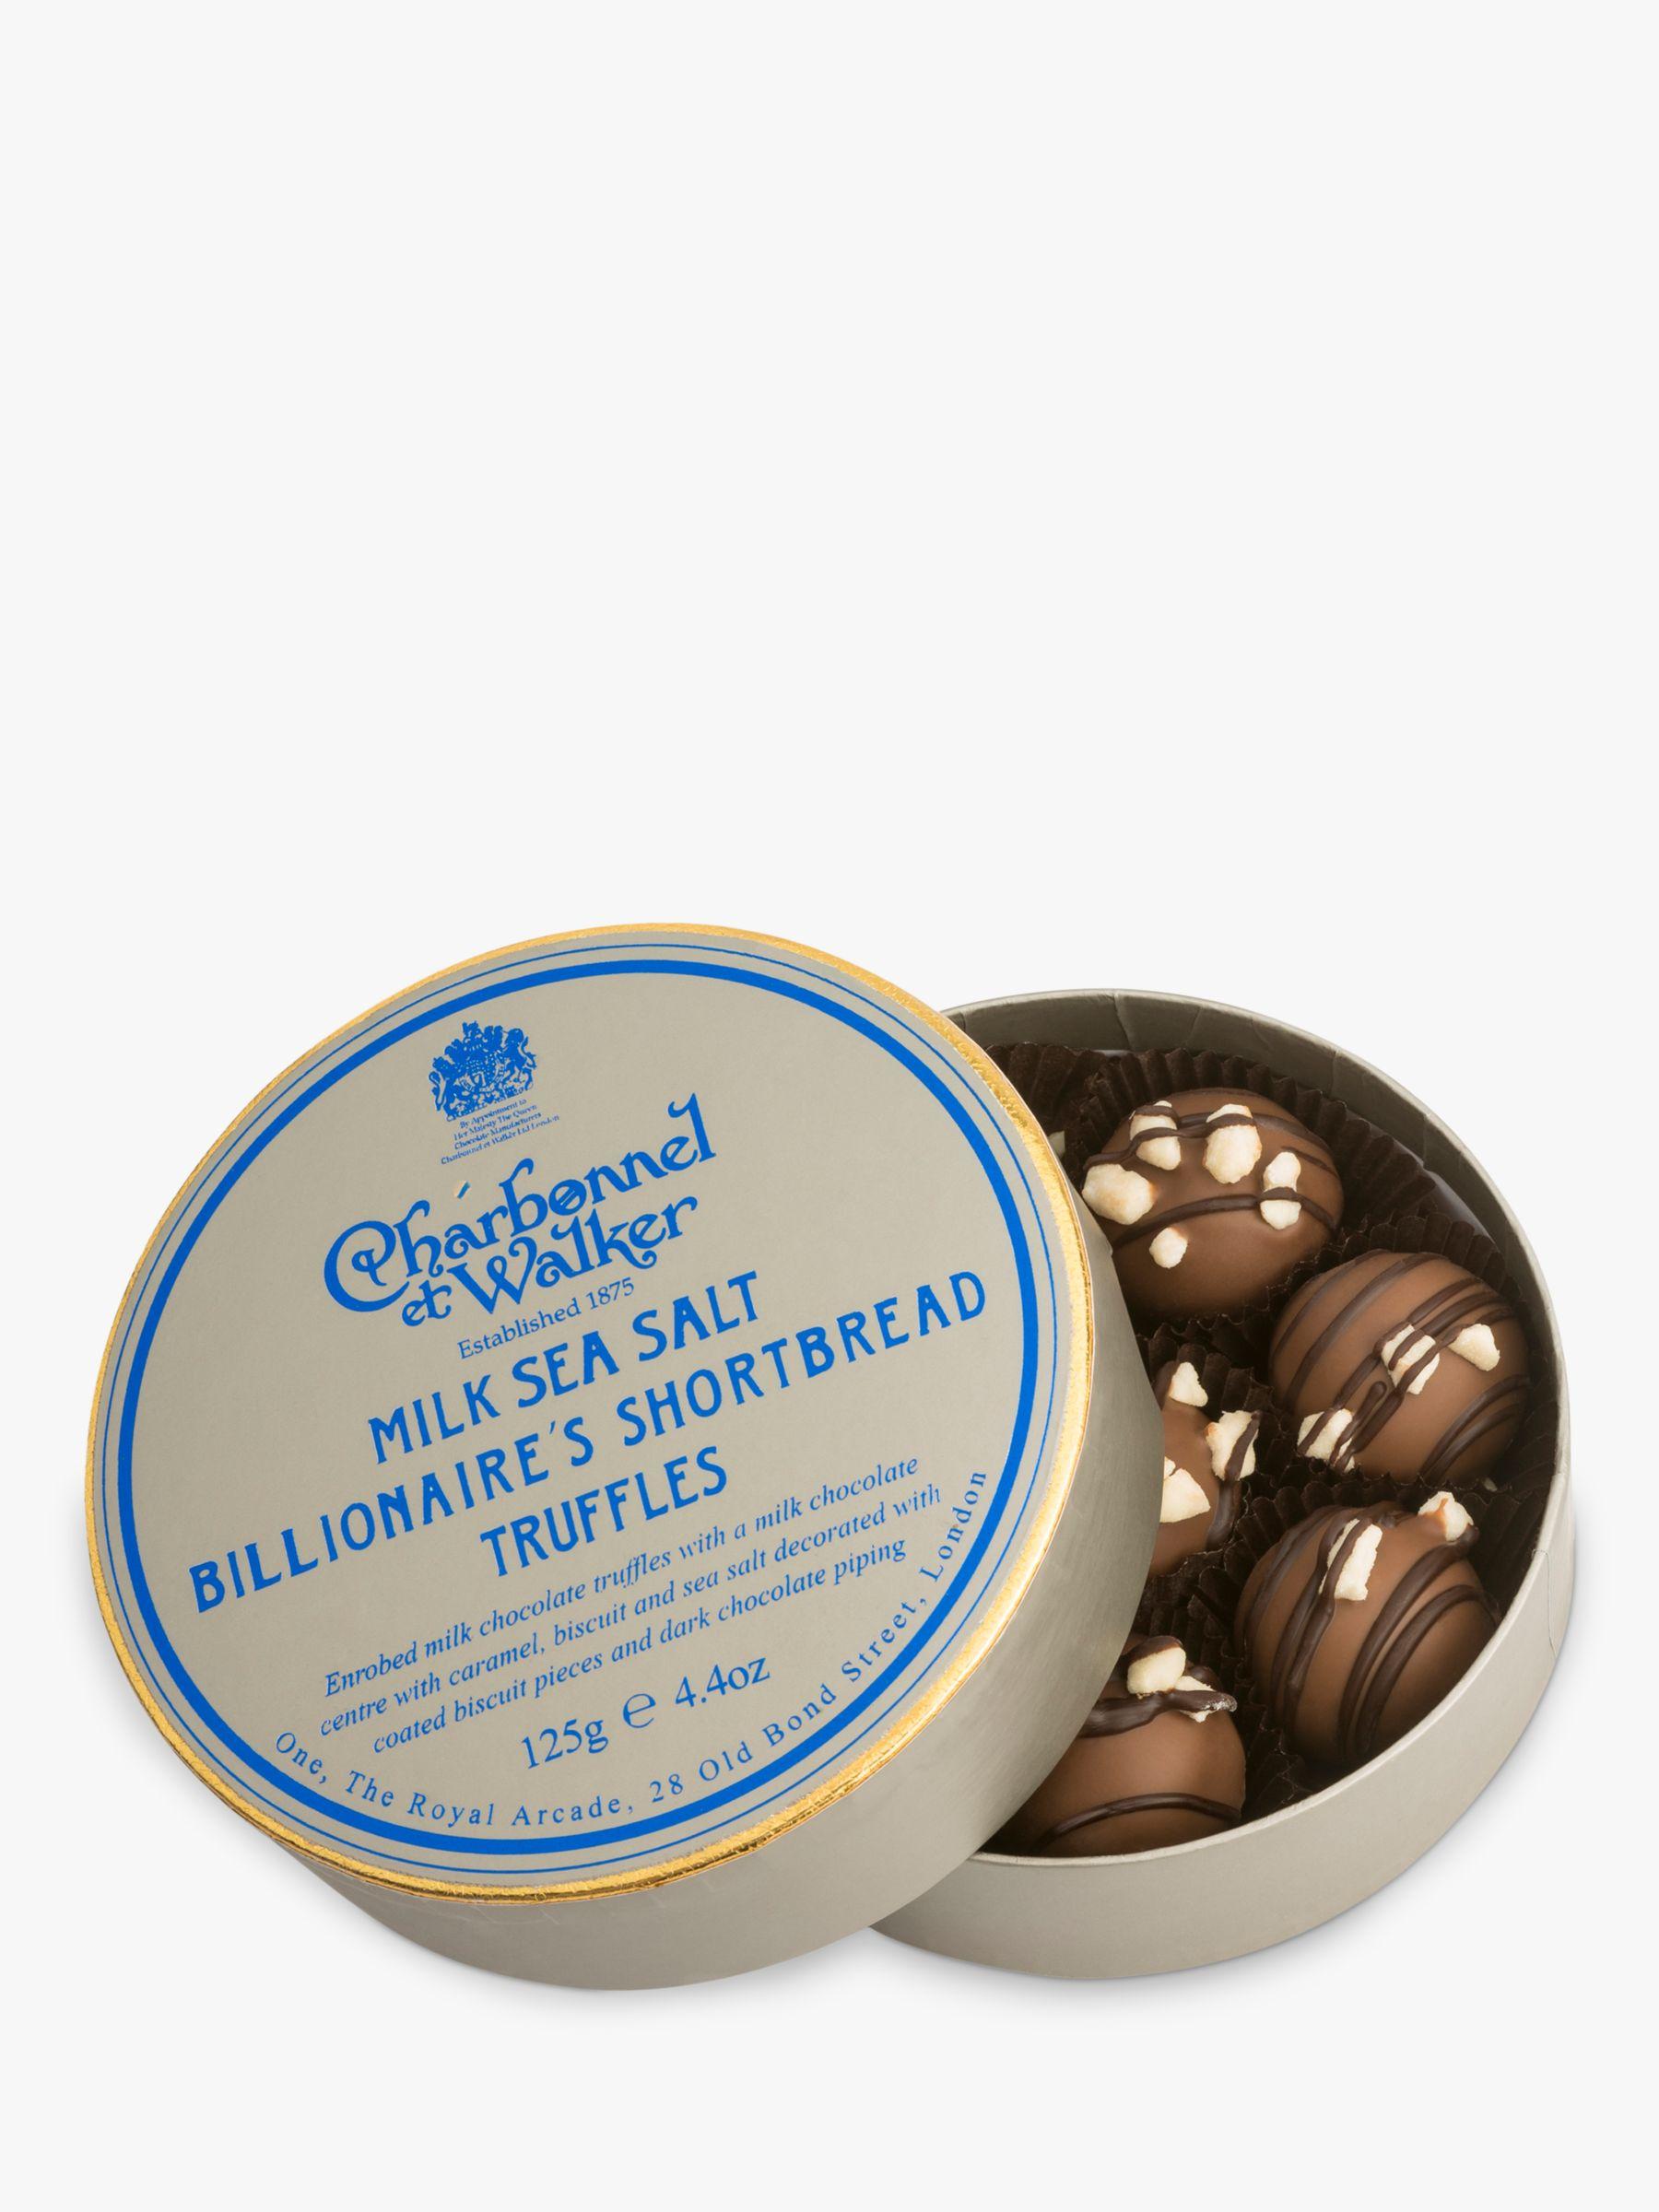 Charbonnel et Walker Charbonnel et Walker Billionaire Shortbread Truffles, Box of 8, 125g